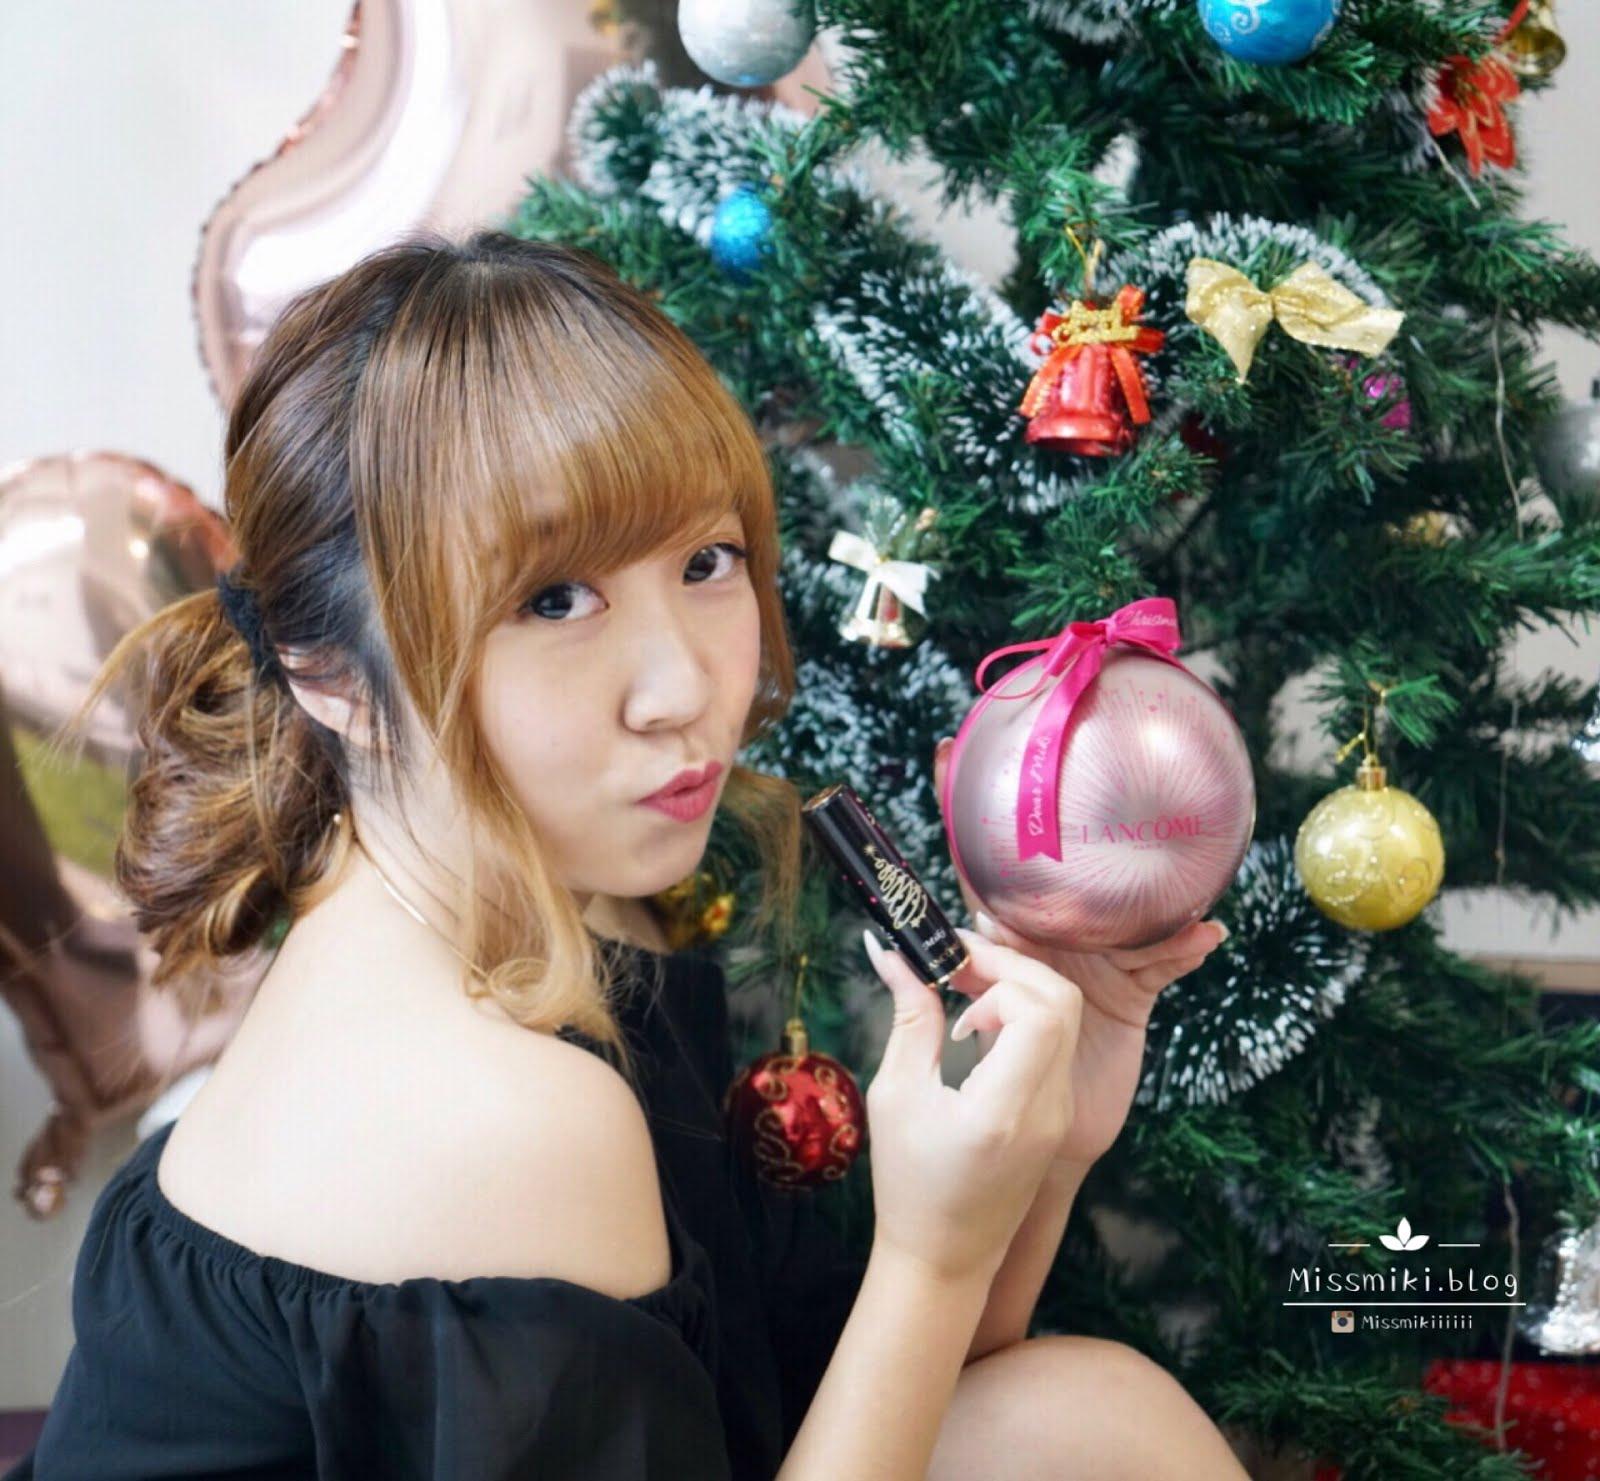 fdb976964d Beautylife HK - 訂製專屬唇膏丨Lancôme「瑰麗唇膏個人化」巡迴活動 - 訂 ...